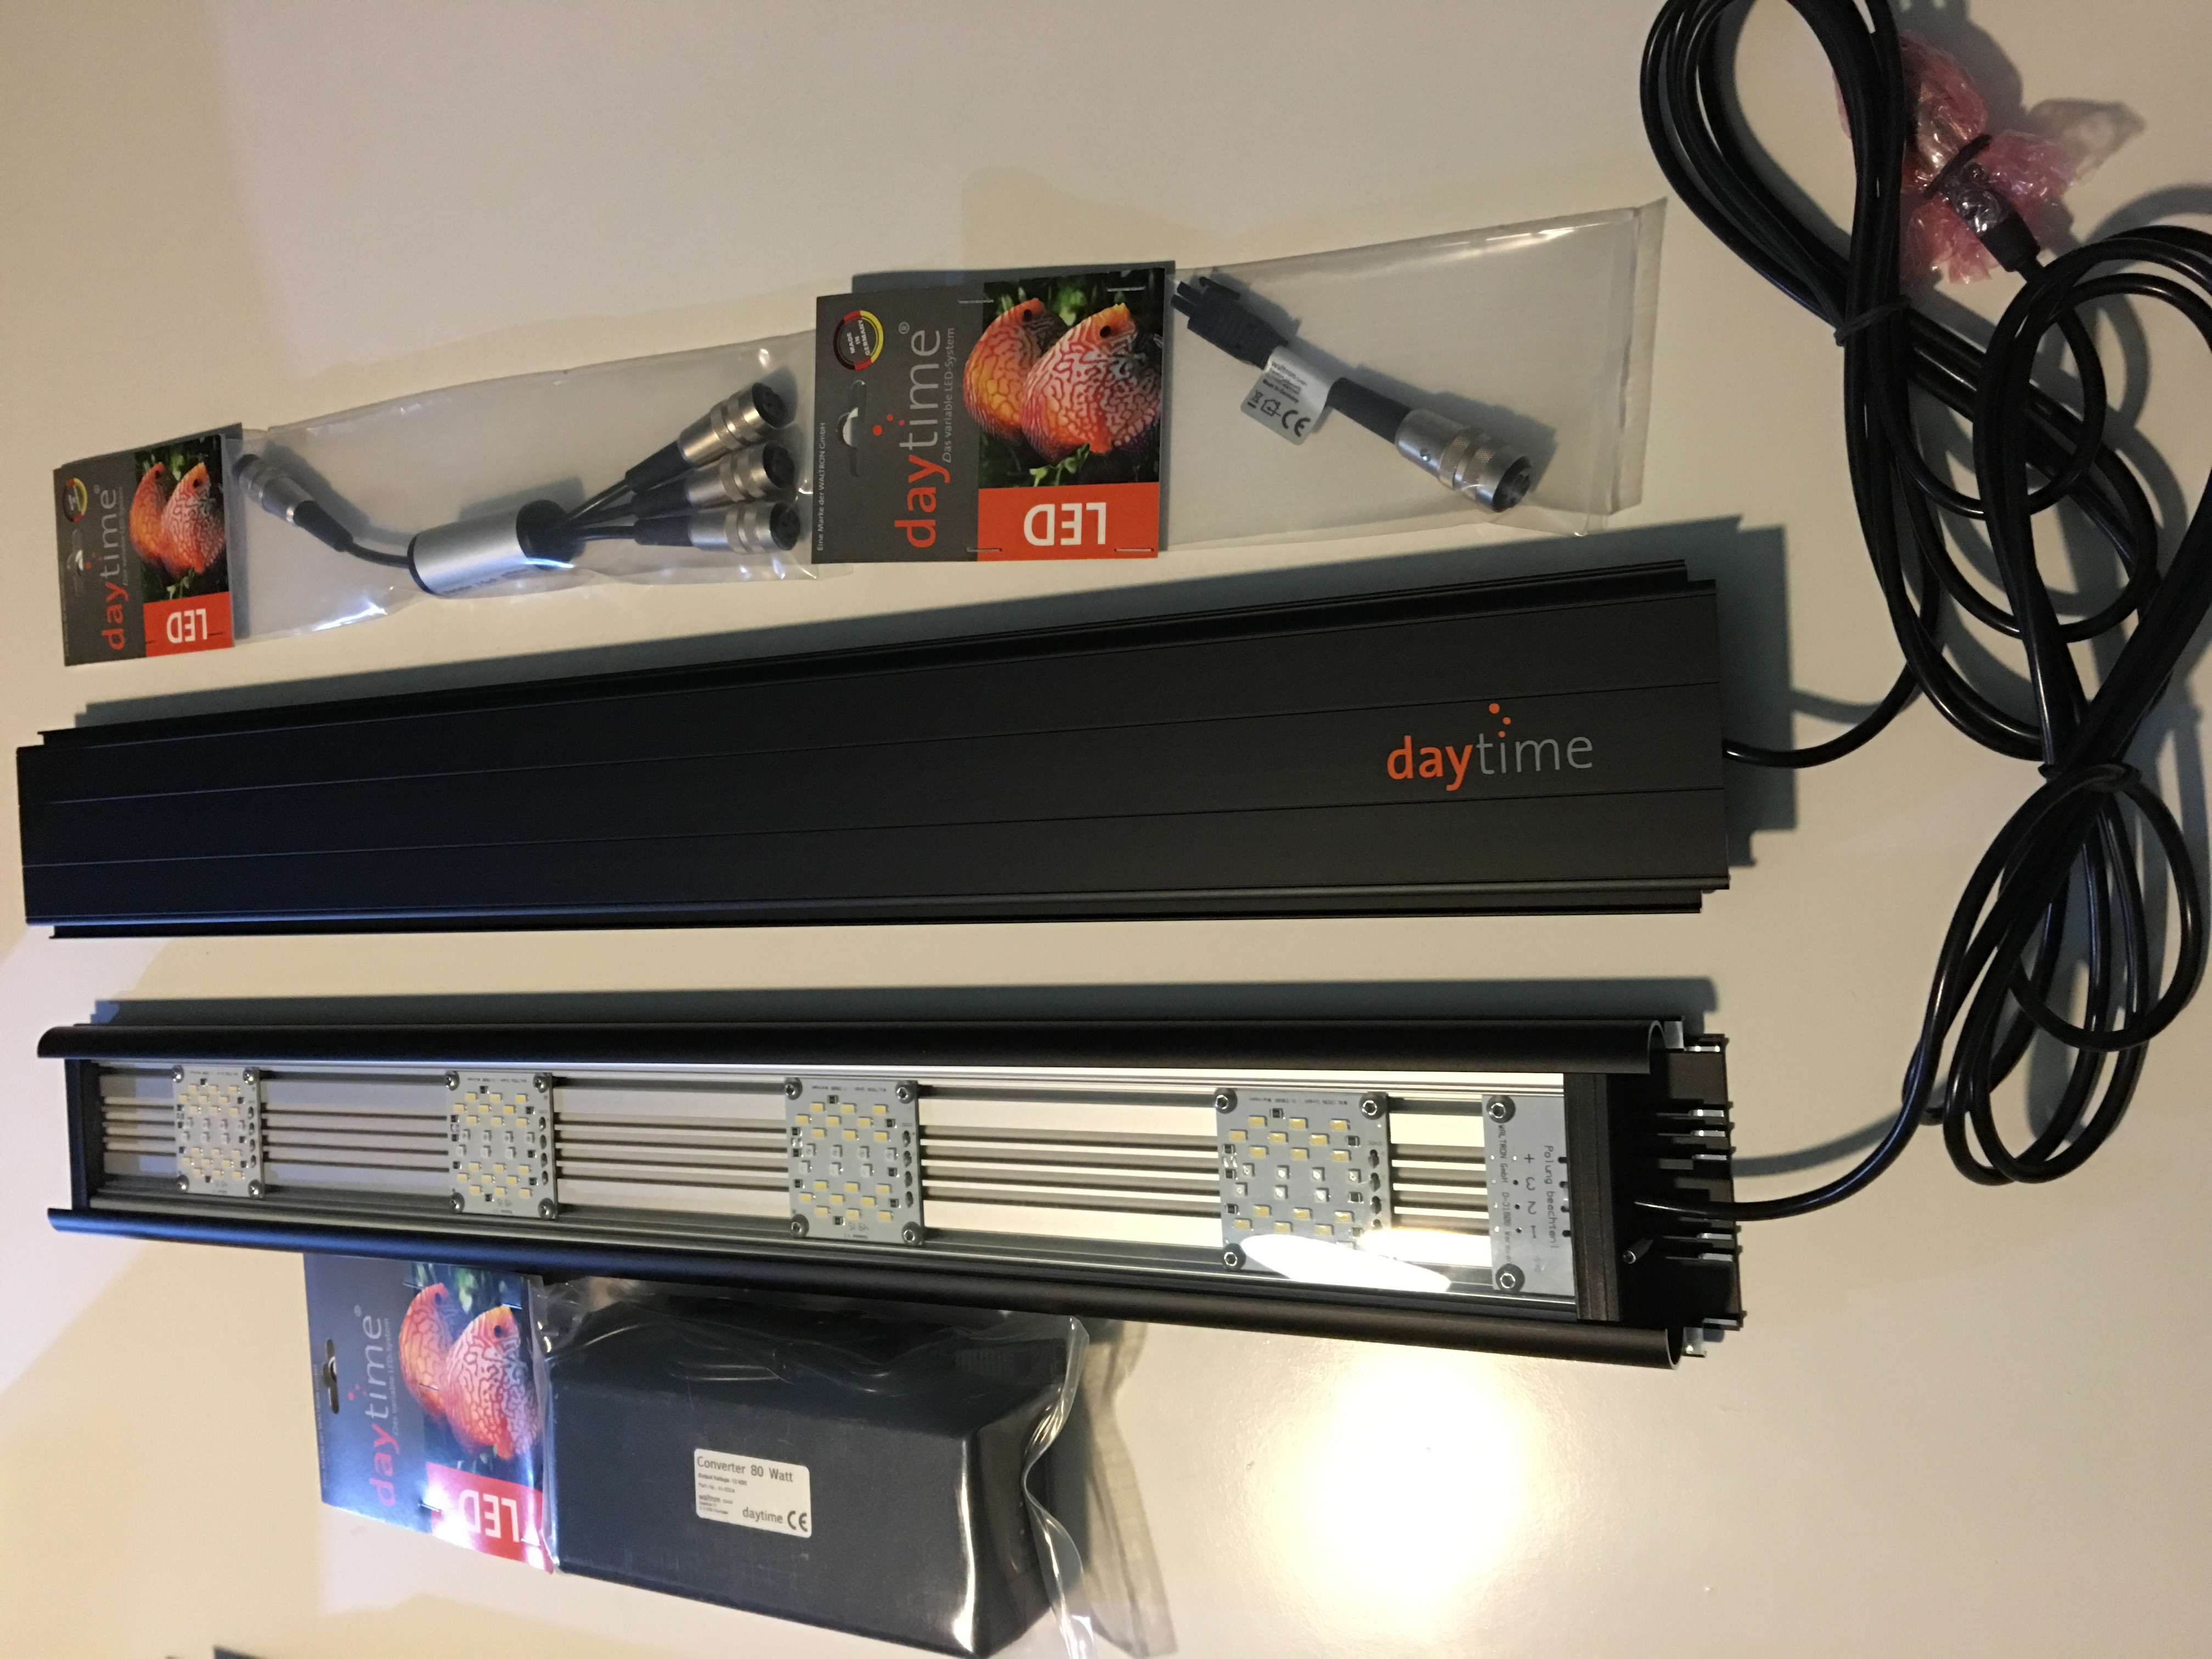 Juwel Lido 200 (Asiatique) - Daytime LED 80w - JBL i1501 - Page 6 468864image658